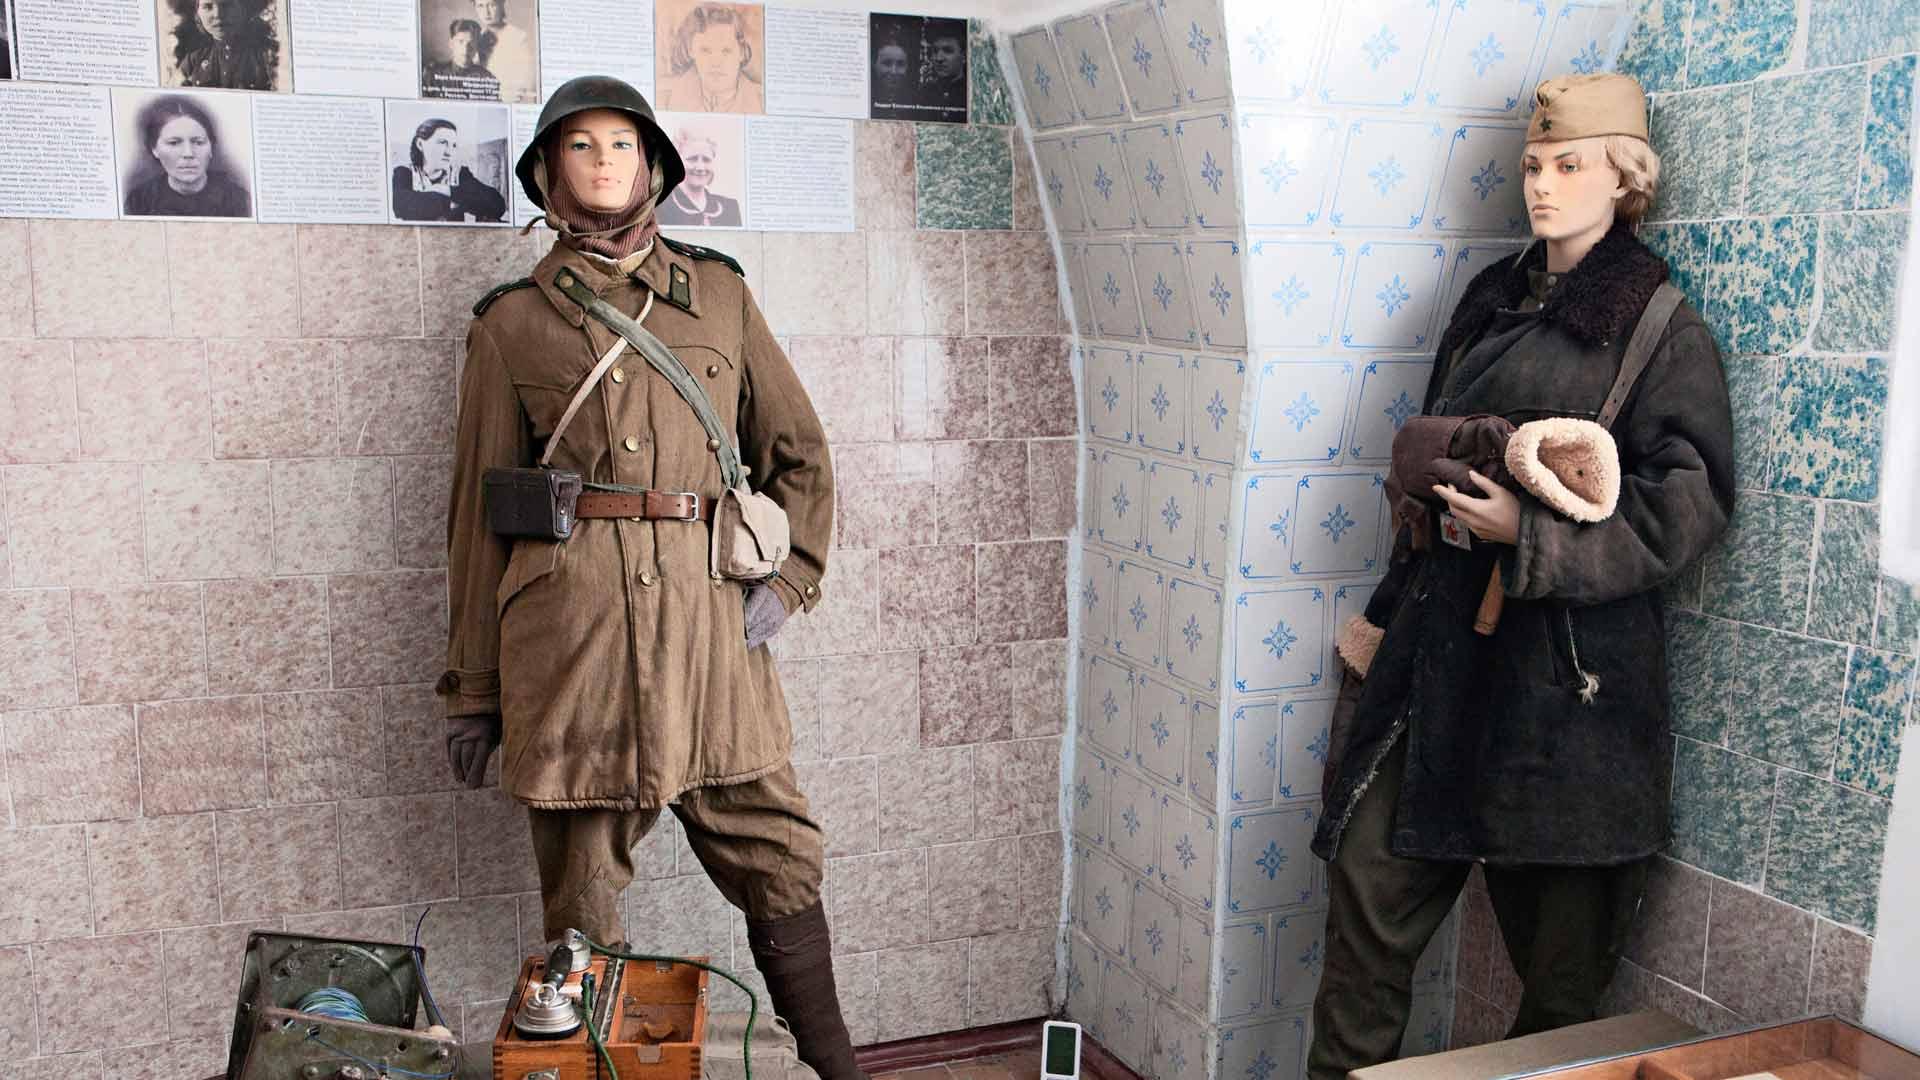 Puna-armeijan naissotilaat